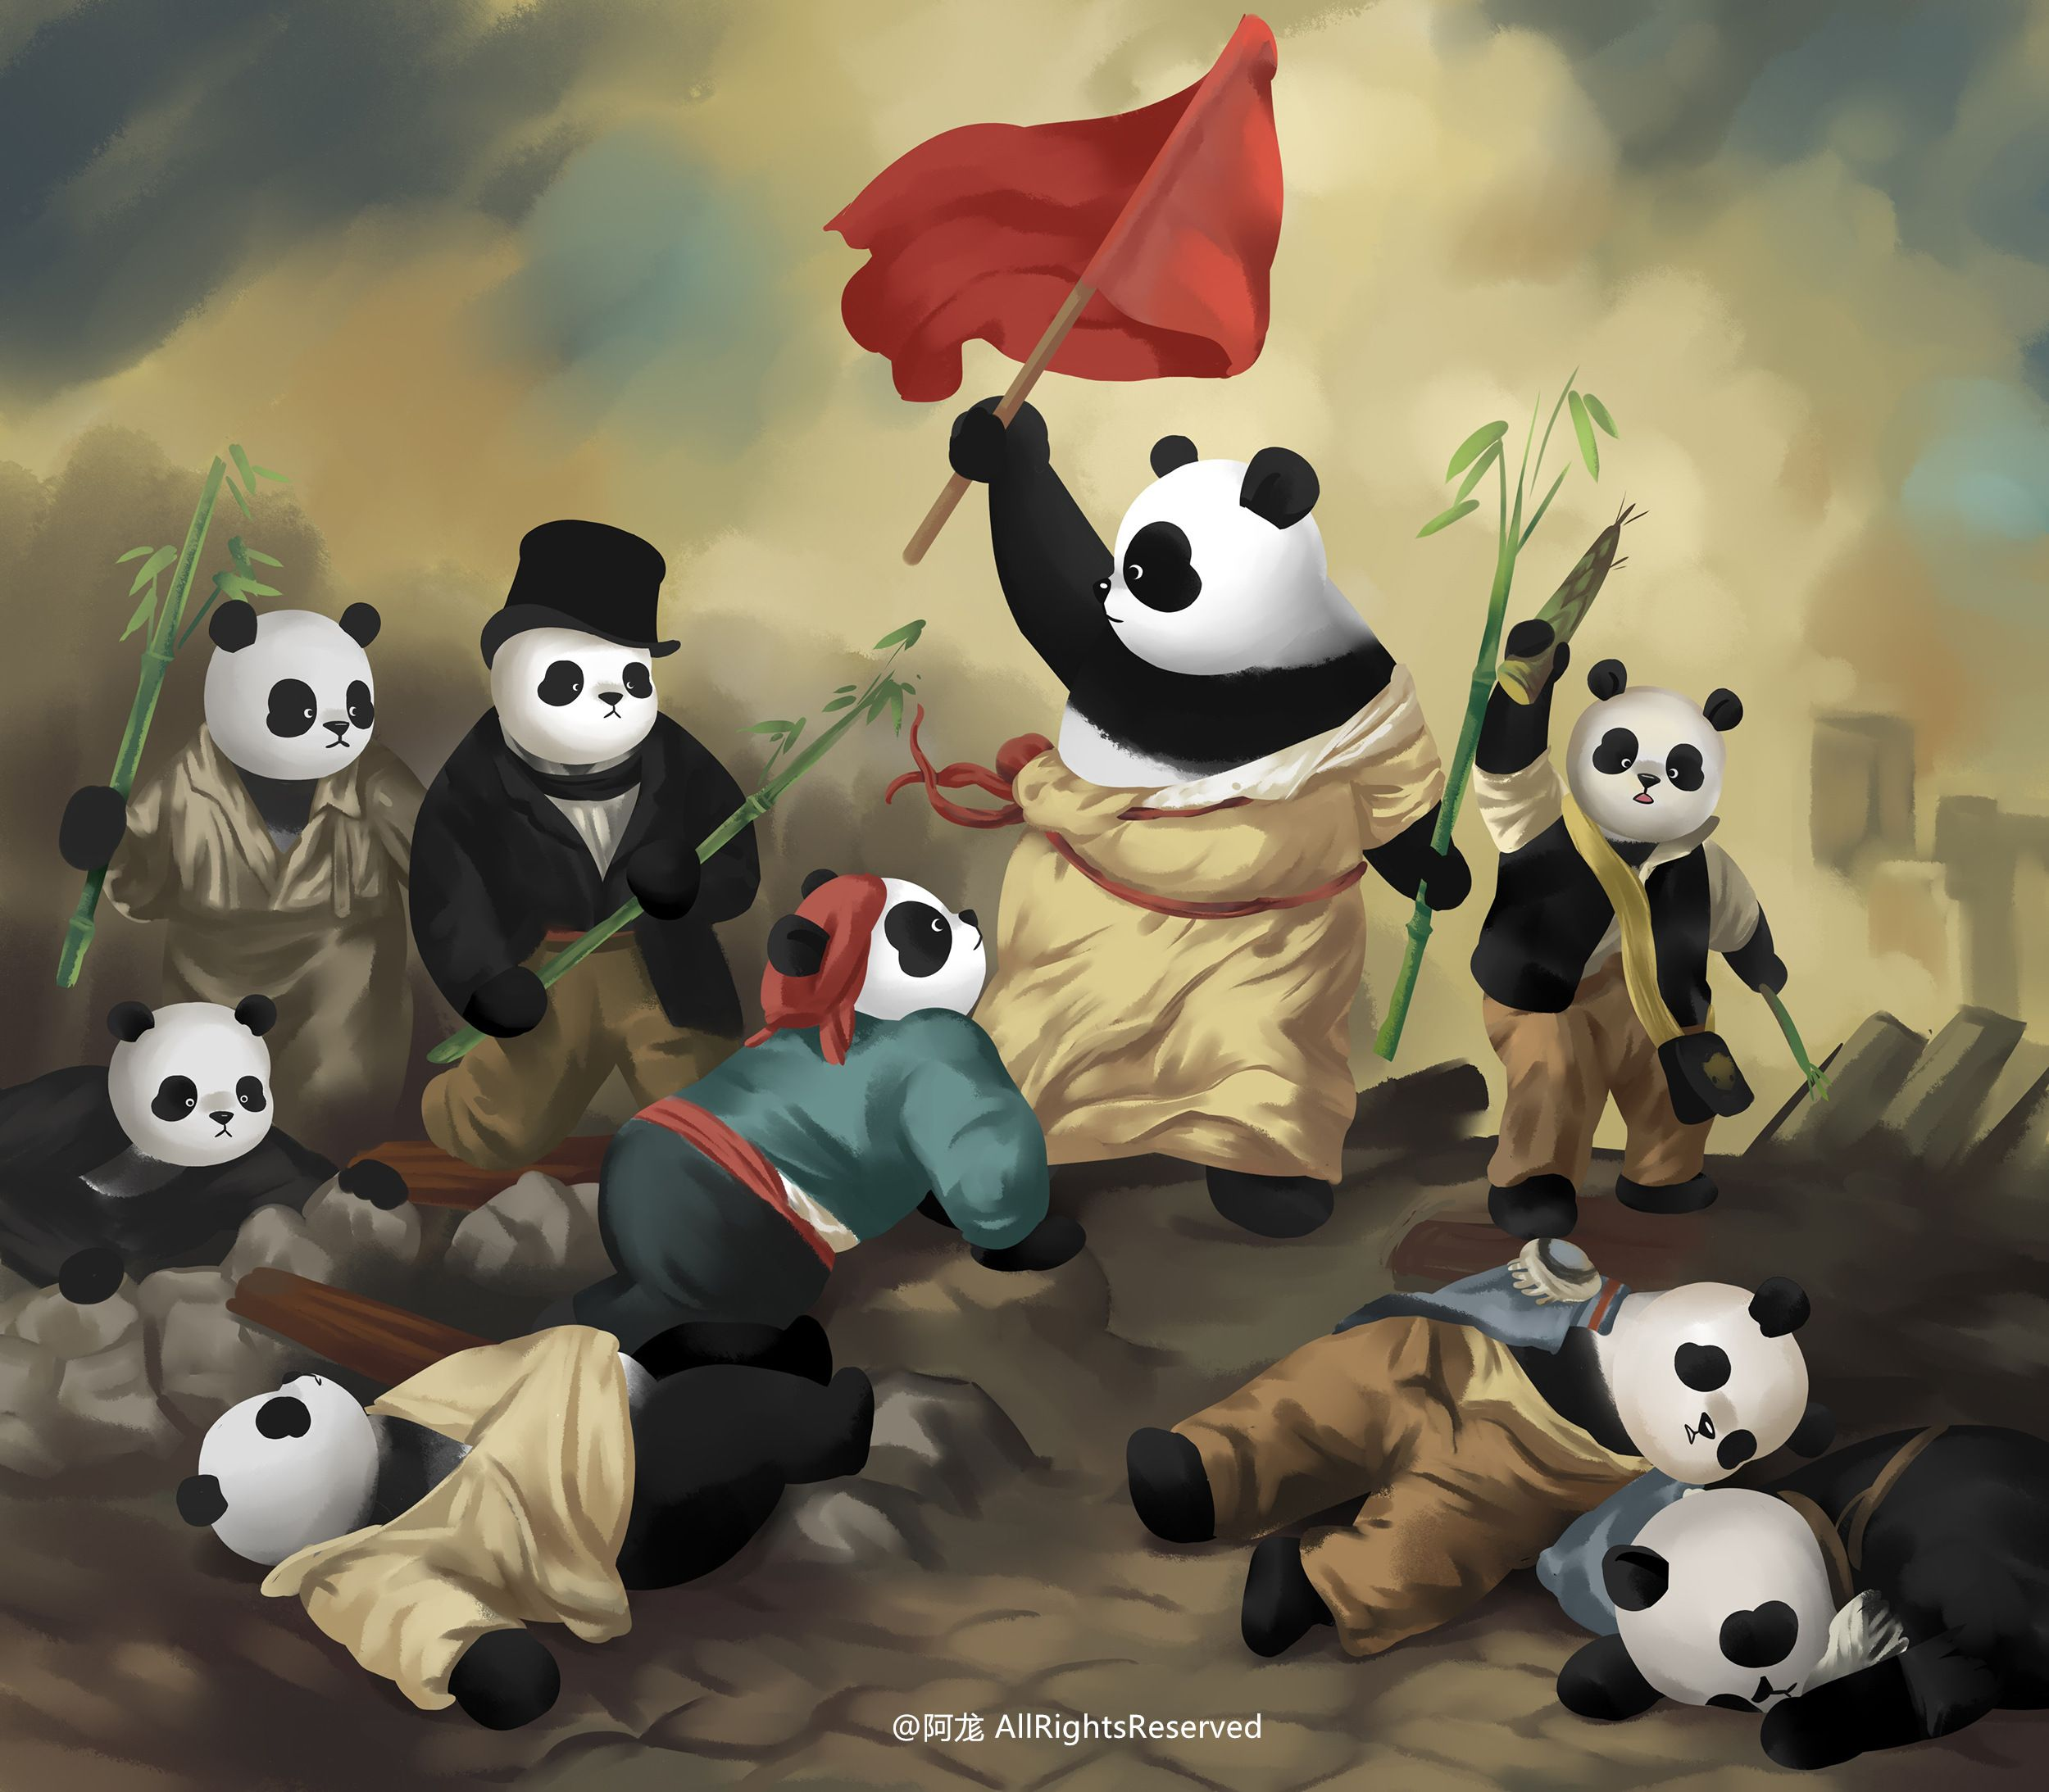 Bamboo Leading The Pandas The Original Painting Liberty Leading